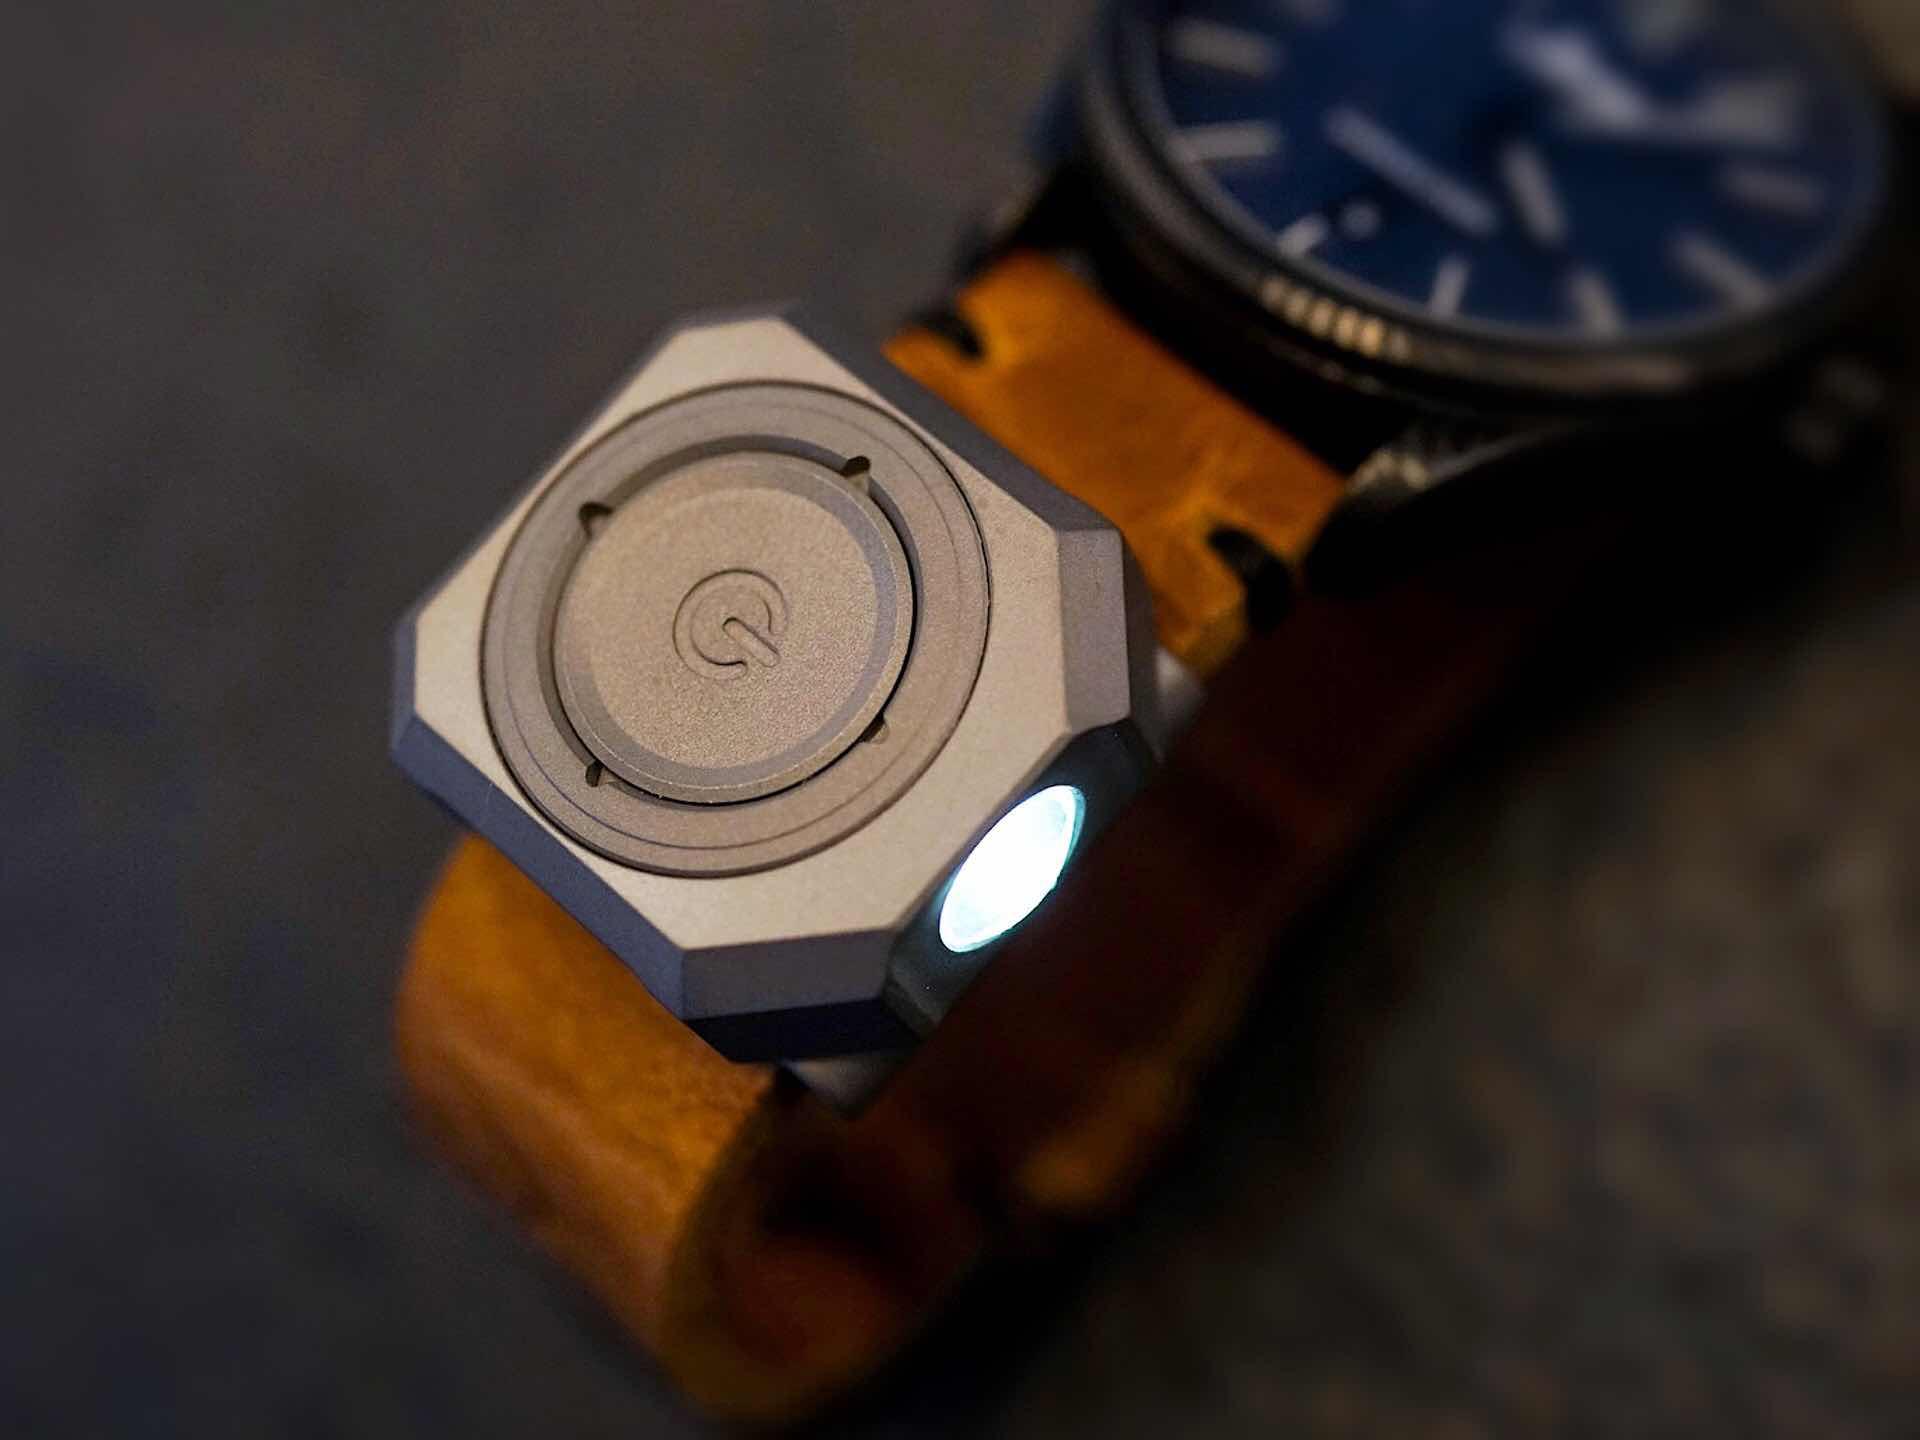 mecarmy-cpl-titanium-watchband-led-light